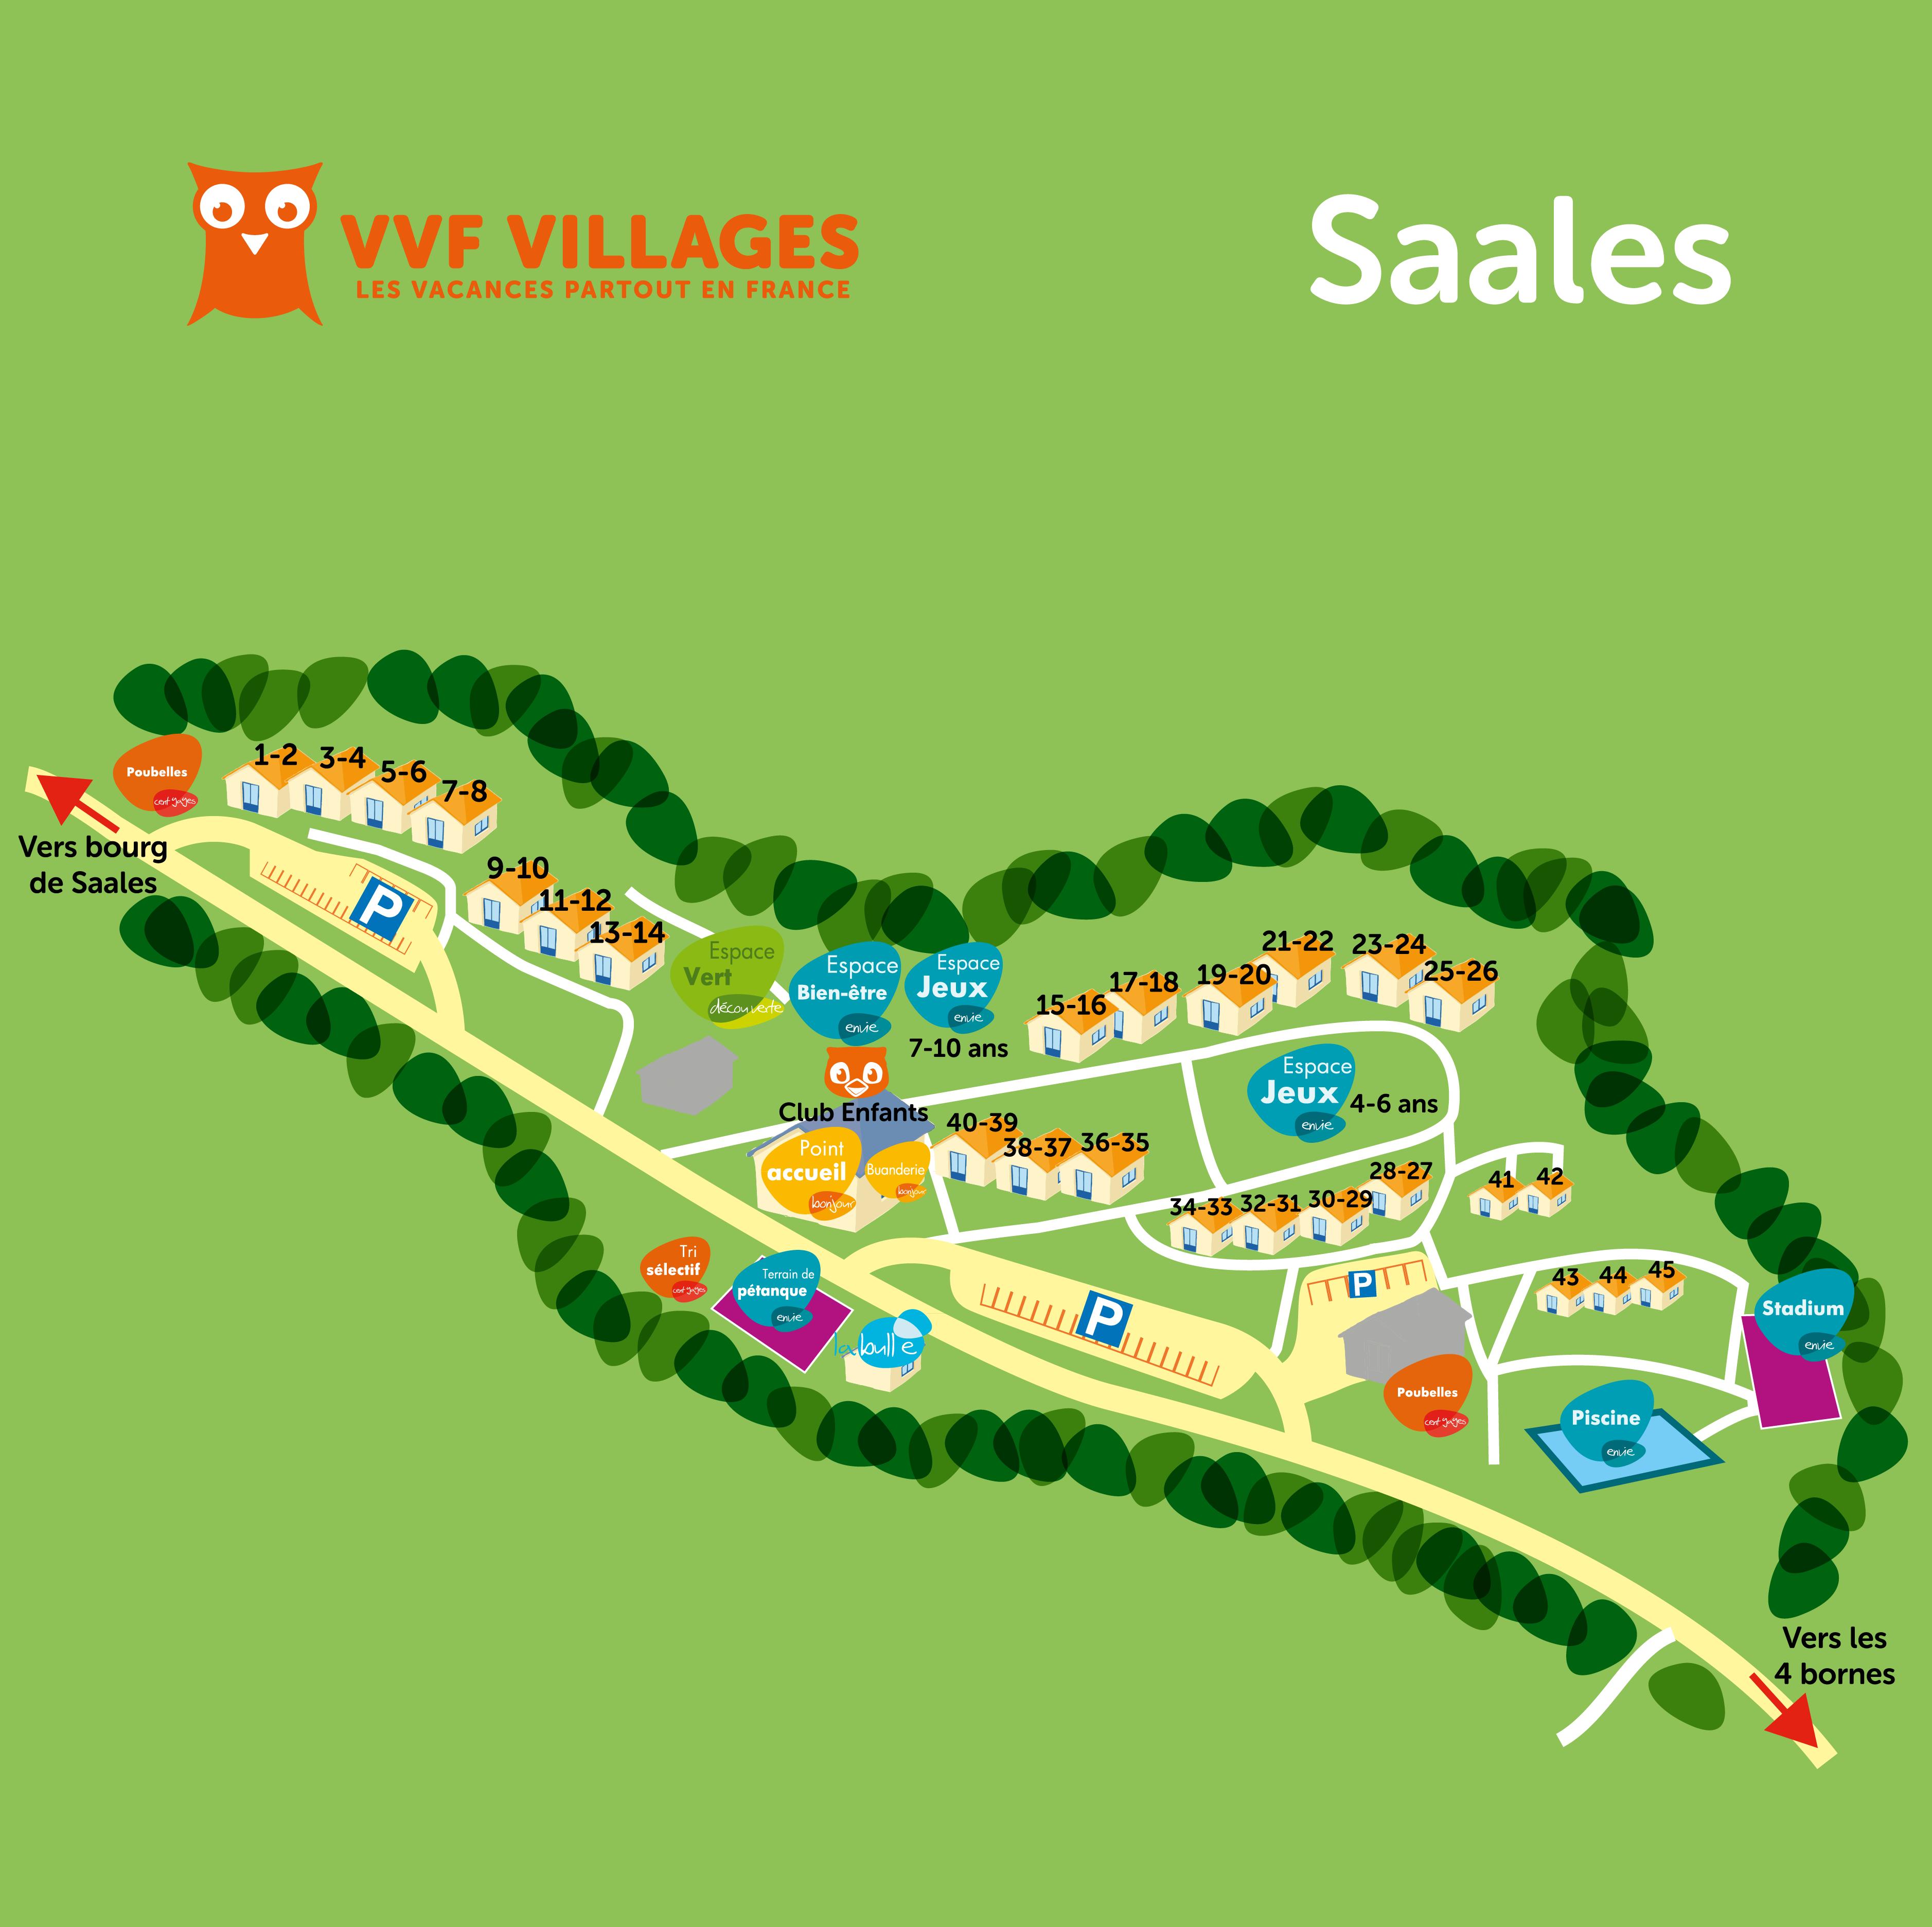 Plan du village de Saales